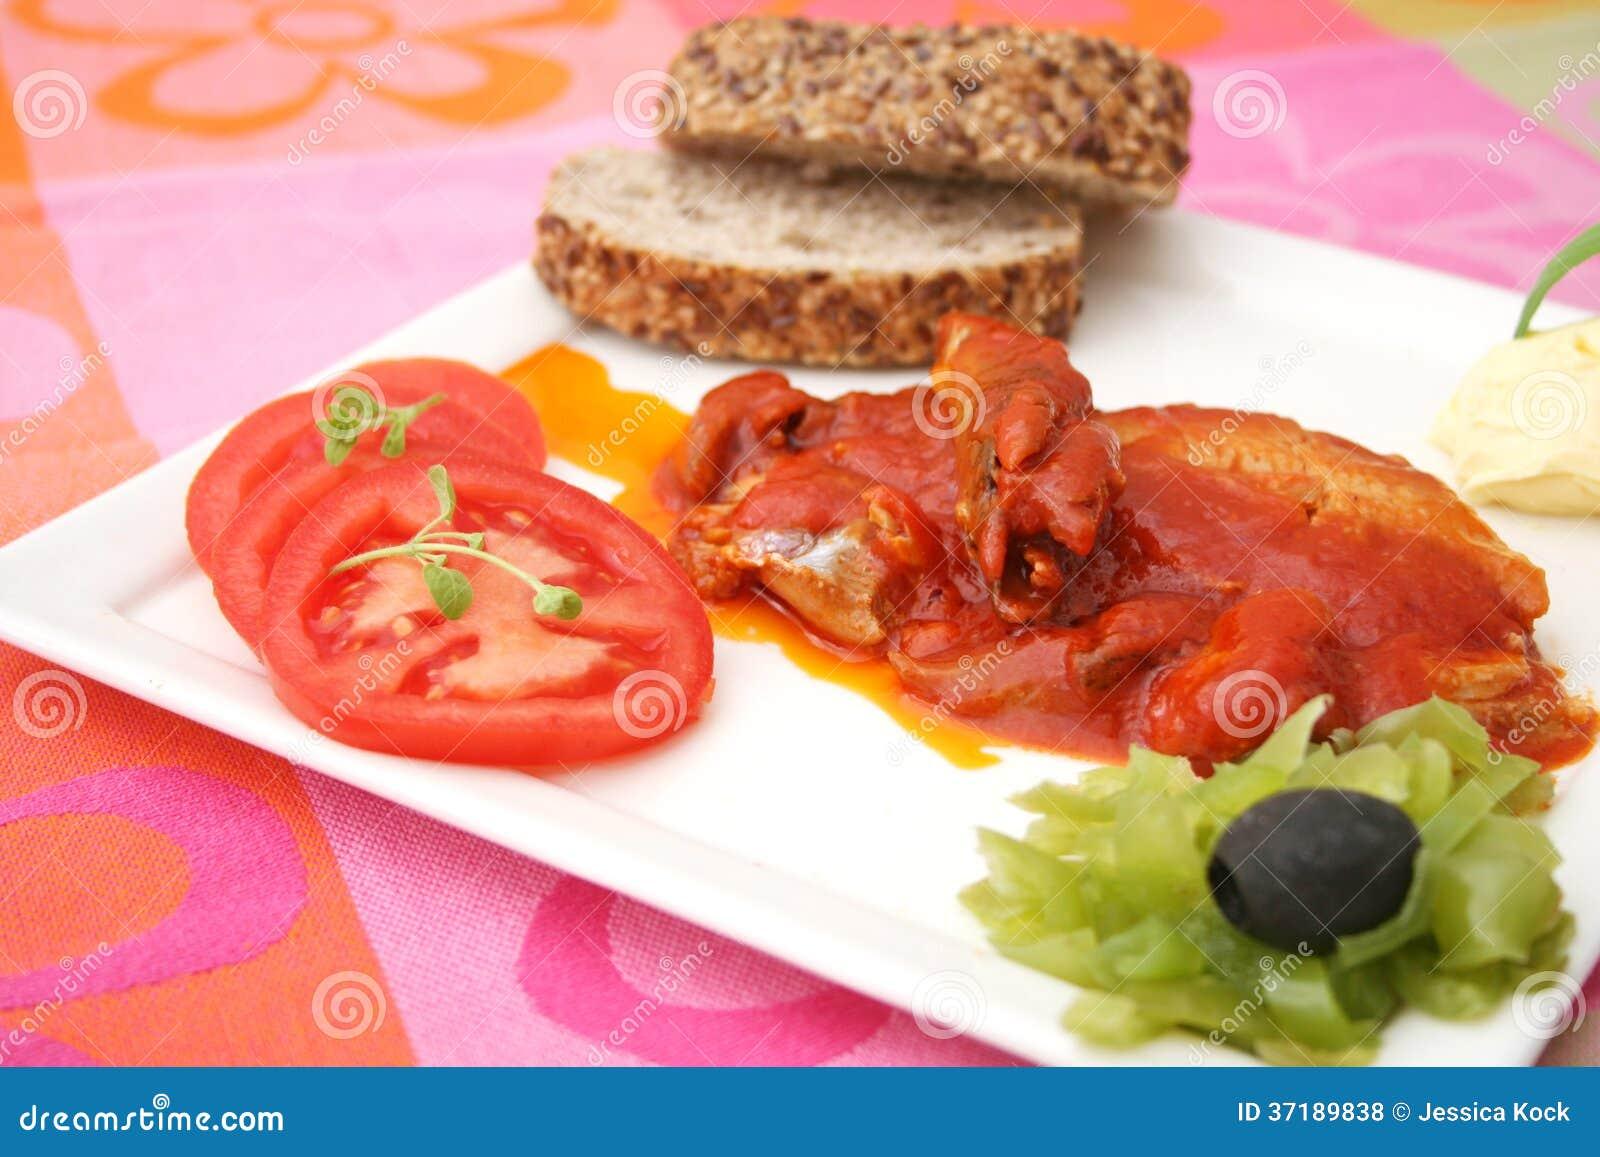 Fish in tomato sauce royalty free stock photos image for Fish in tomato sauce